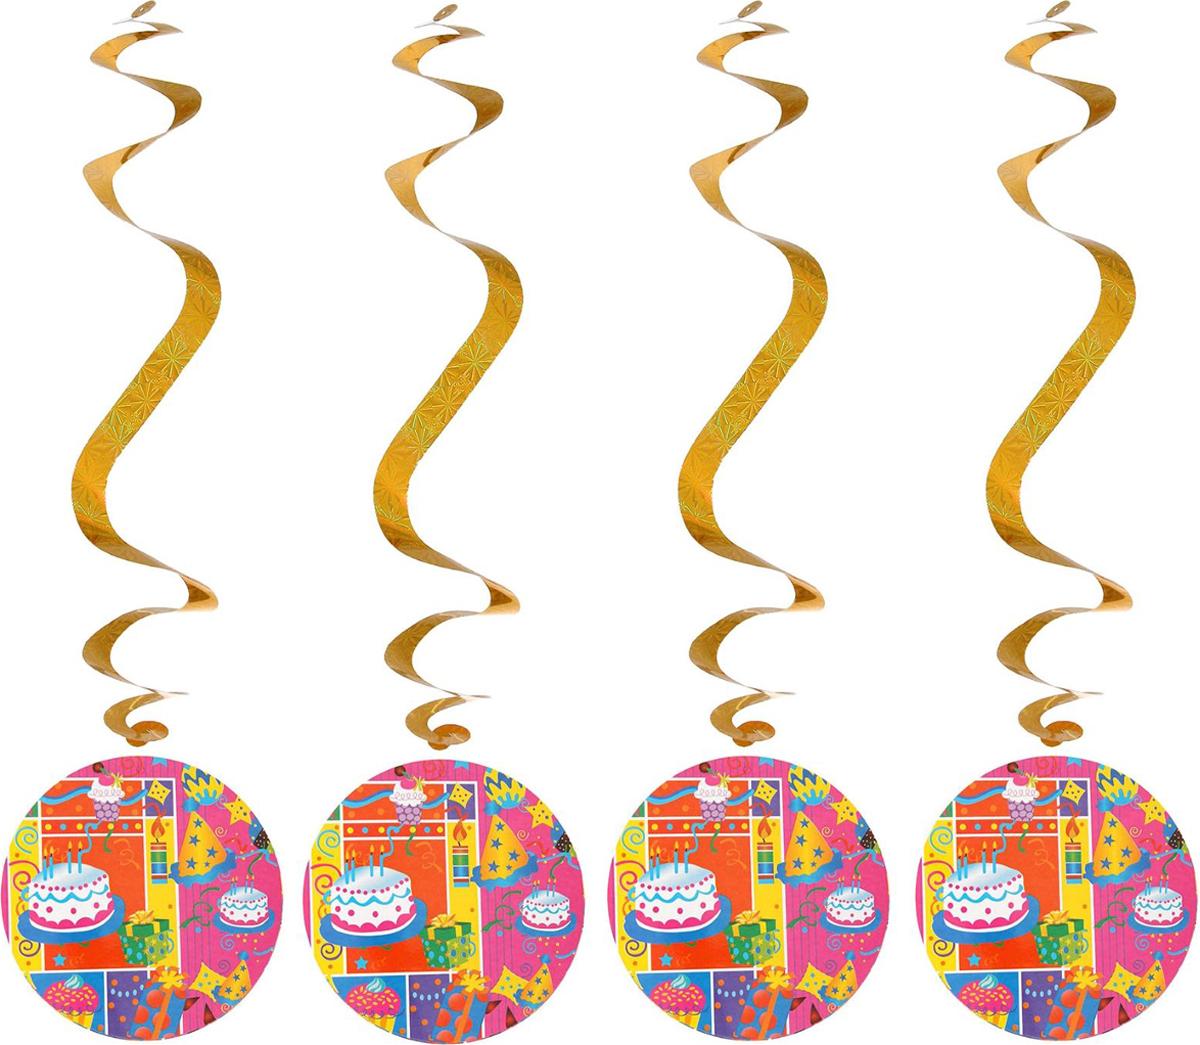 Страна Карнавалия Спираль серпантин Веселый праздник 4 шт 1053274 -  Серпантин